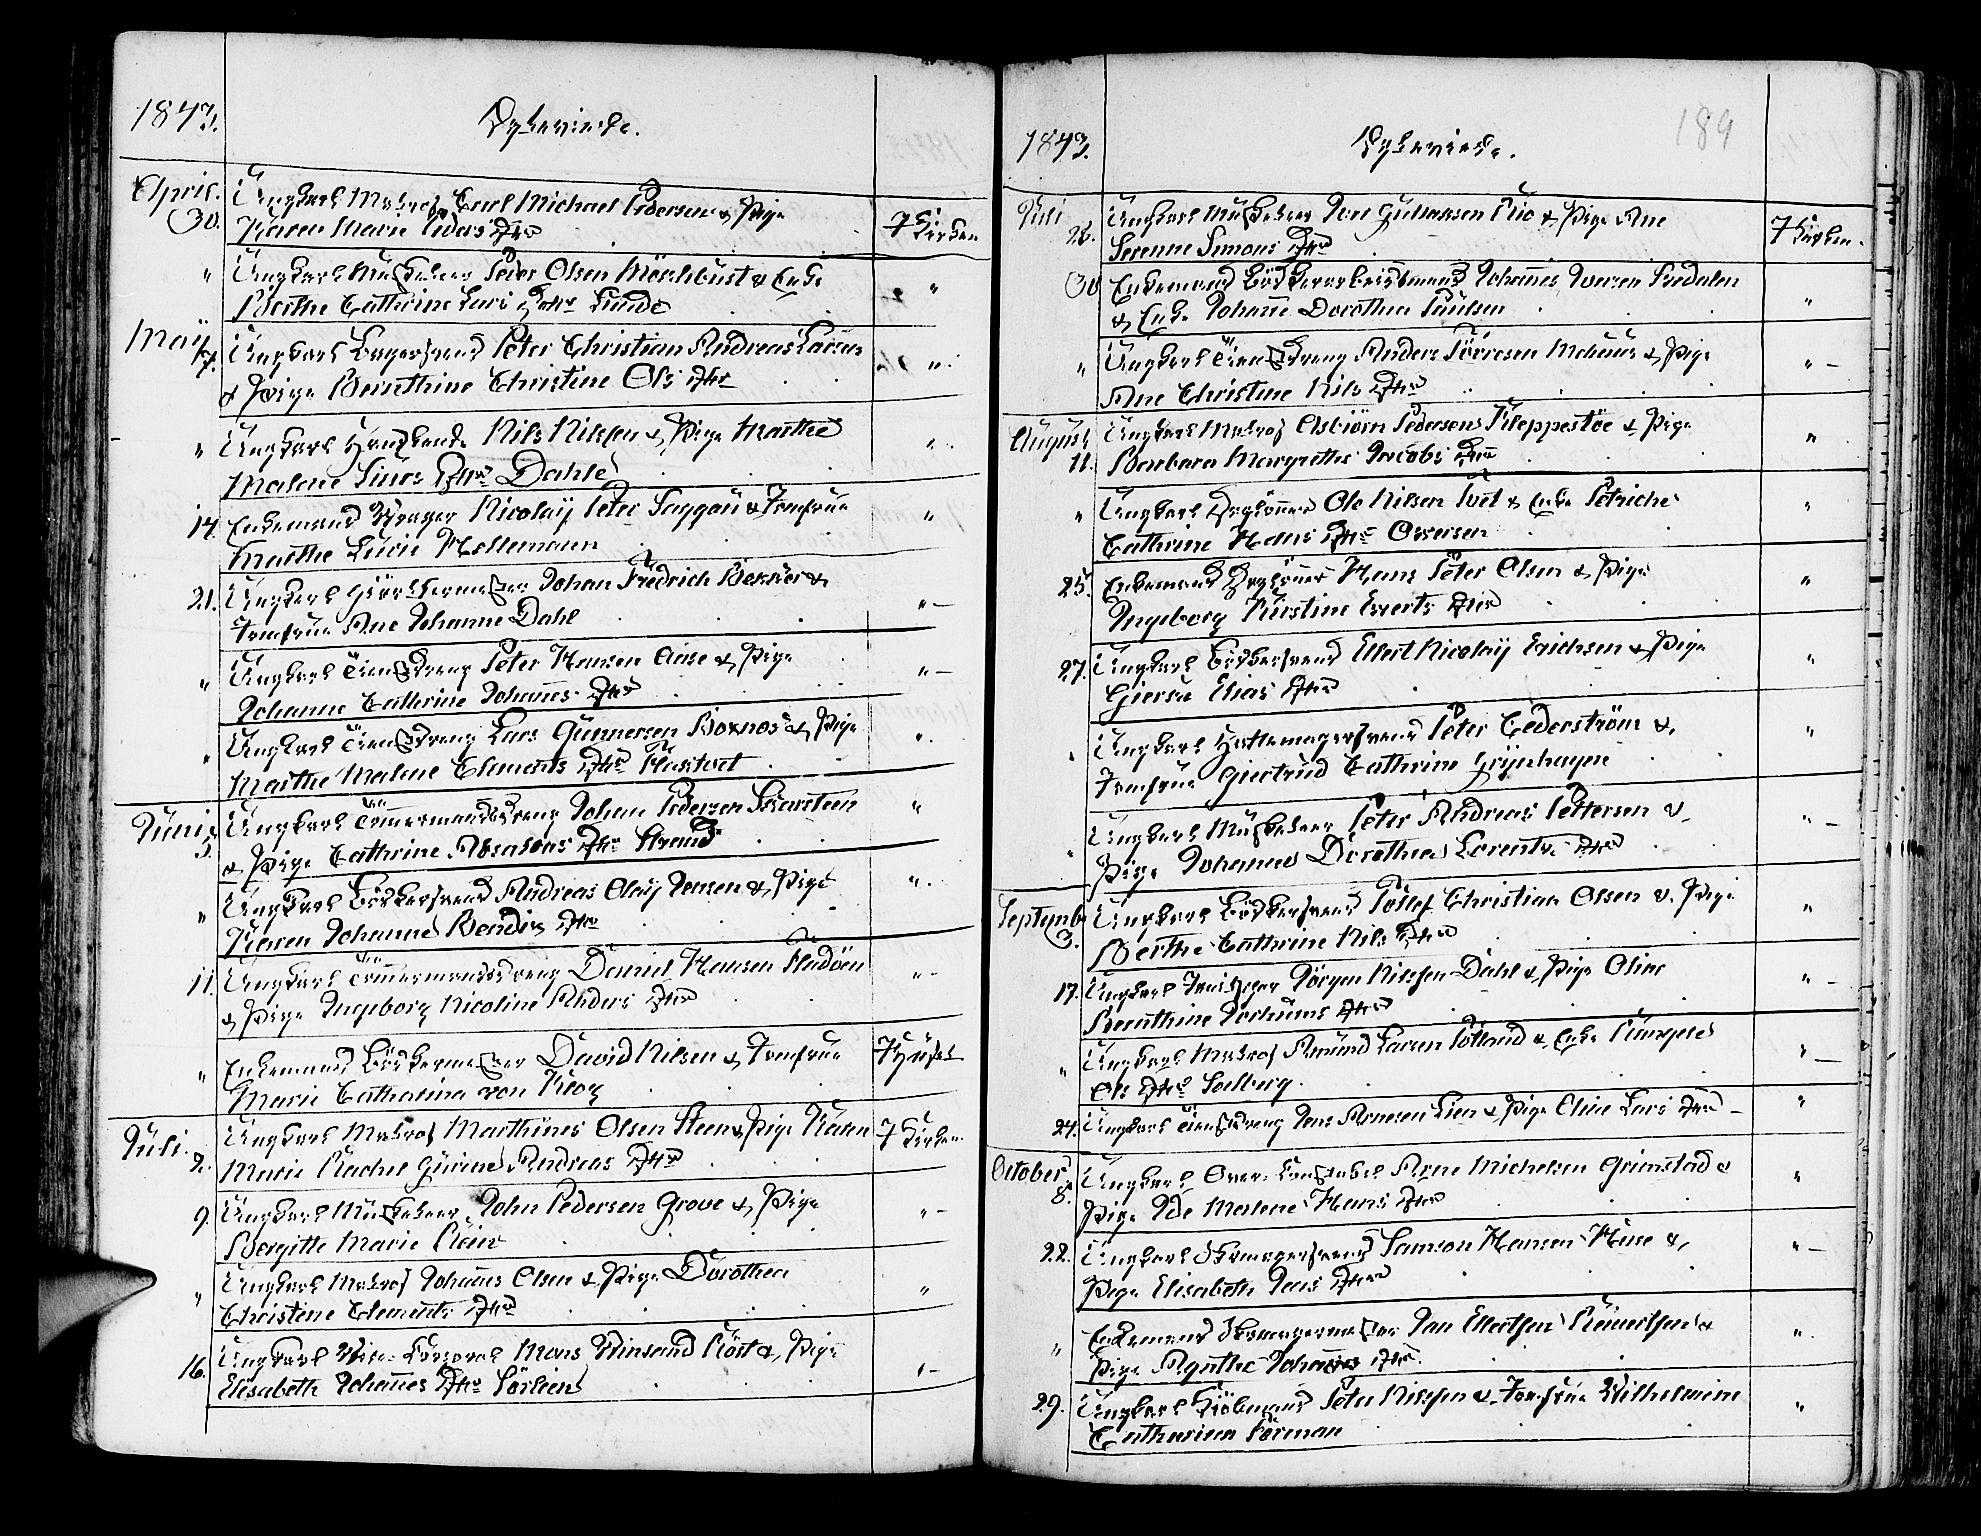 SAB, Korskirken Sokneprestembete, H/Haa/L0009: Ministerialbok nr. A 9, 1743-1861, s. 189